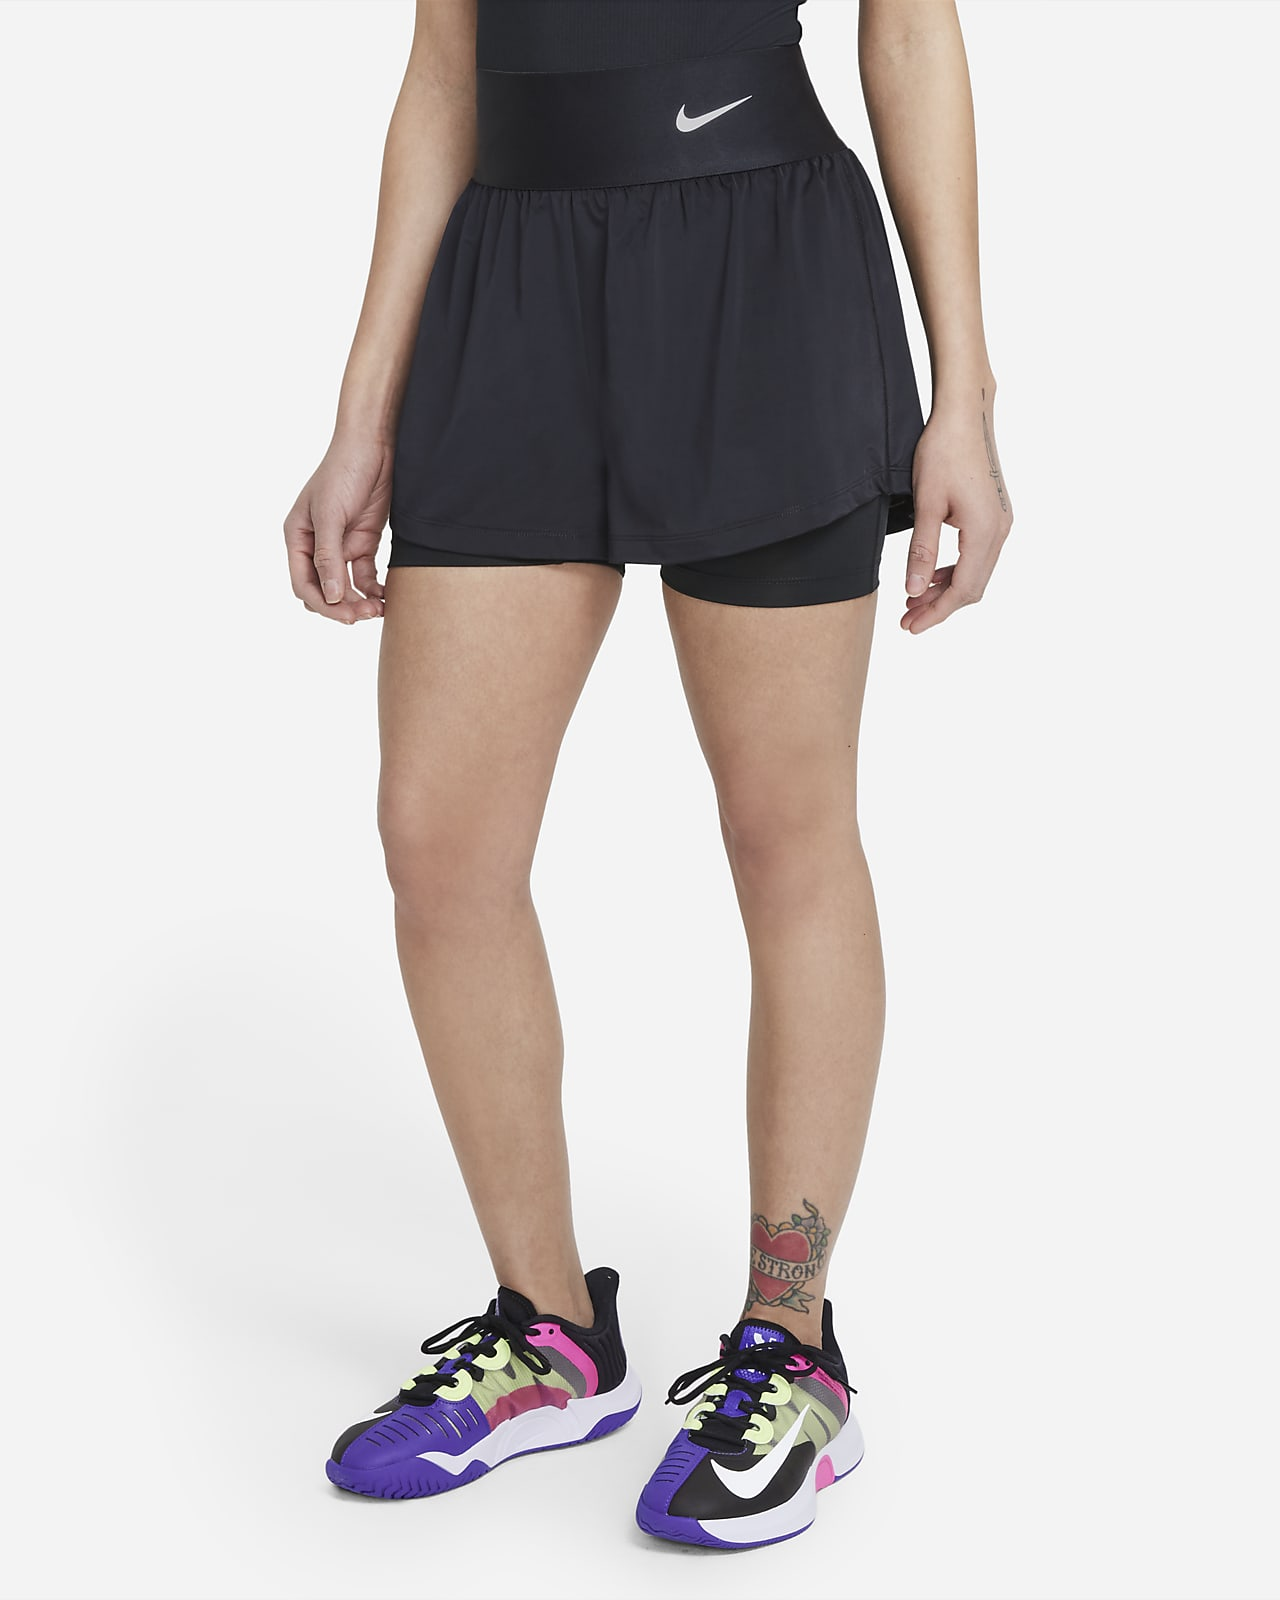 Shorts de tenis para mujer NikeCourt Advantage